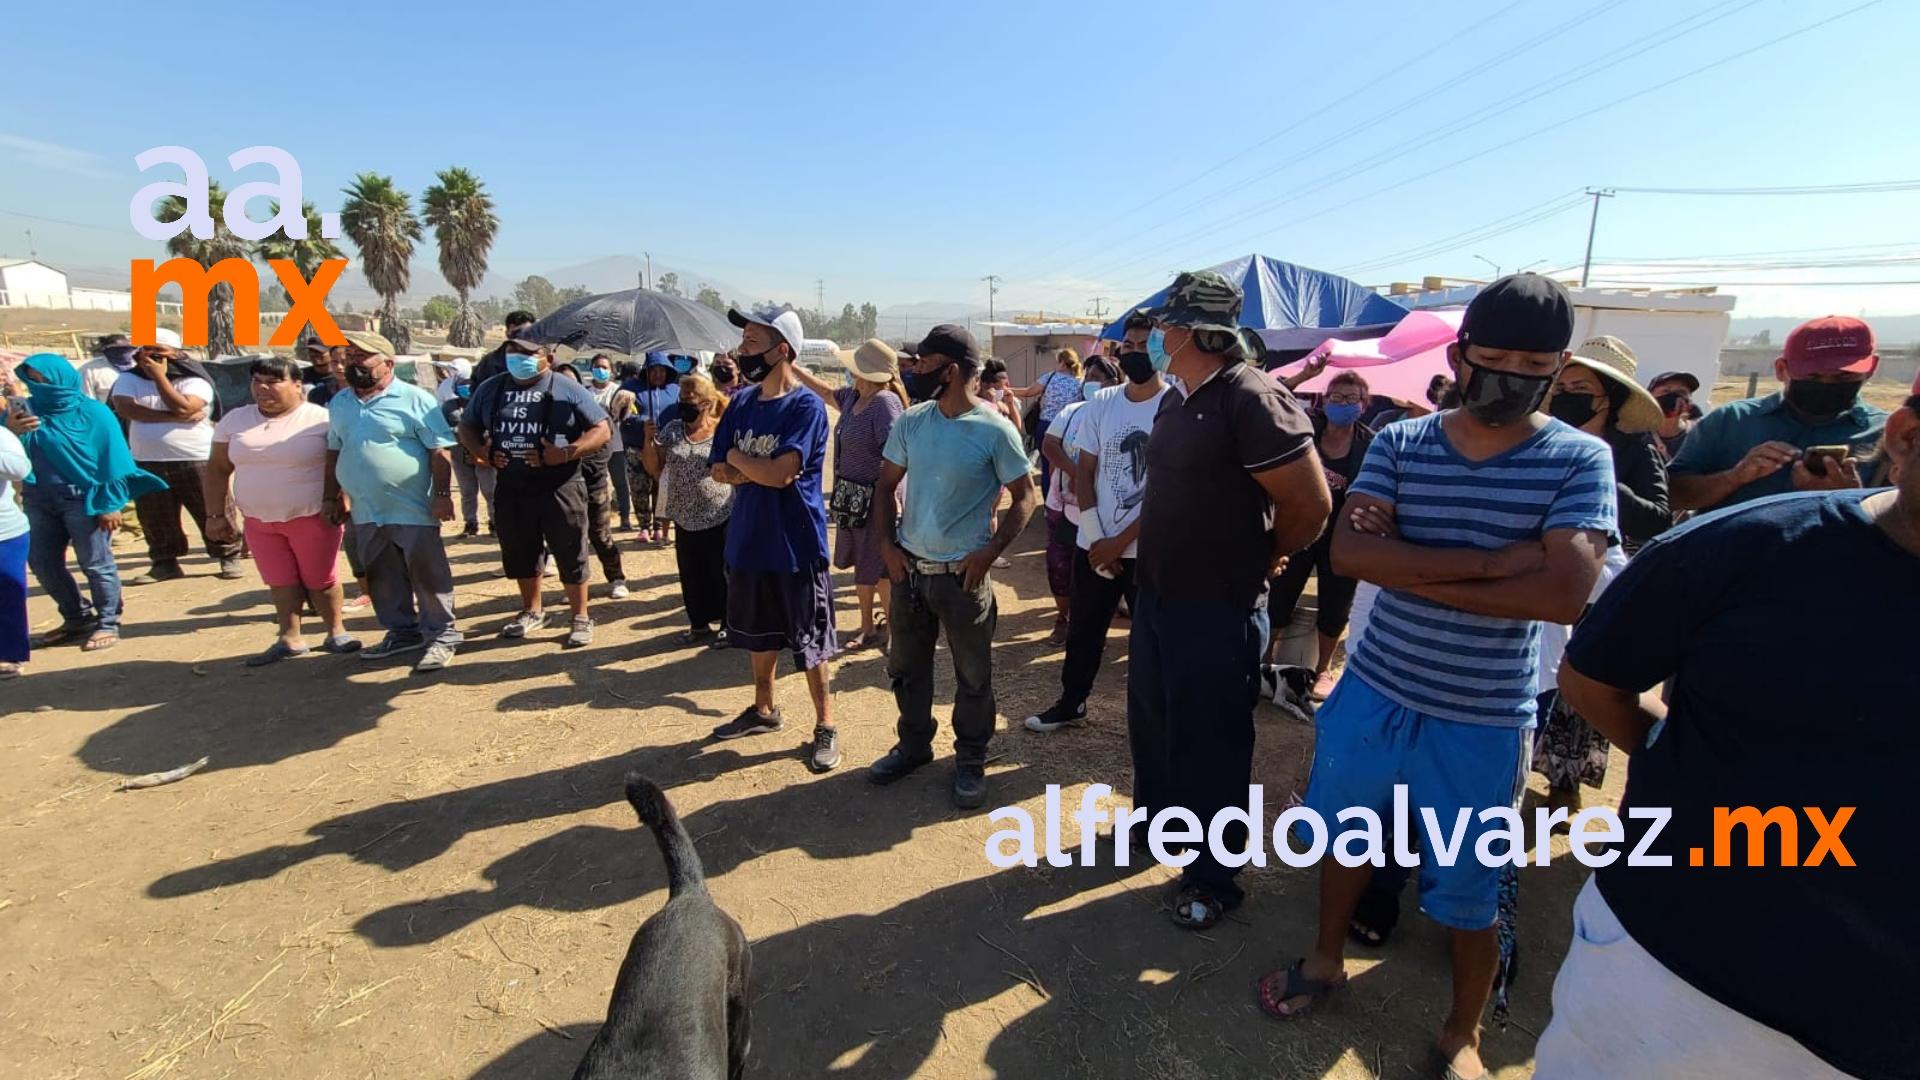 Notifican-invasores-de-Valle-Redondo-para-que-desalojen-en-72-horas